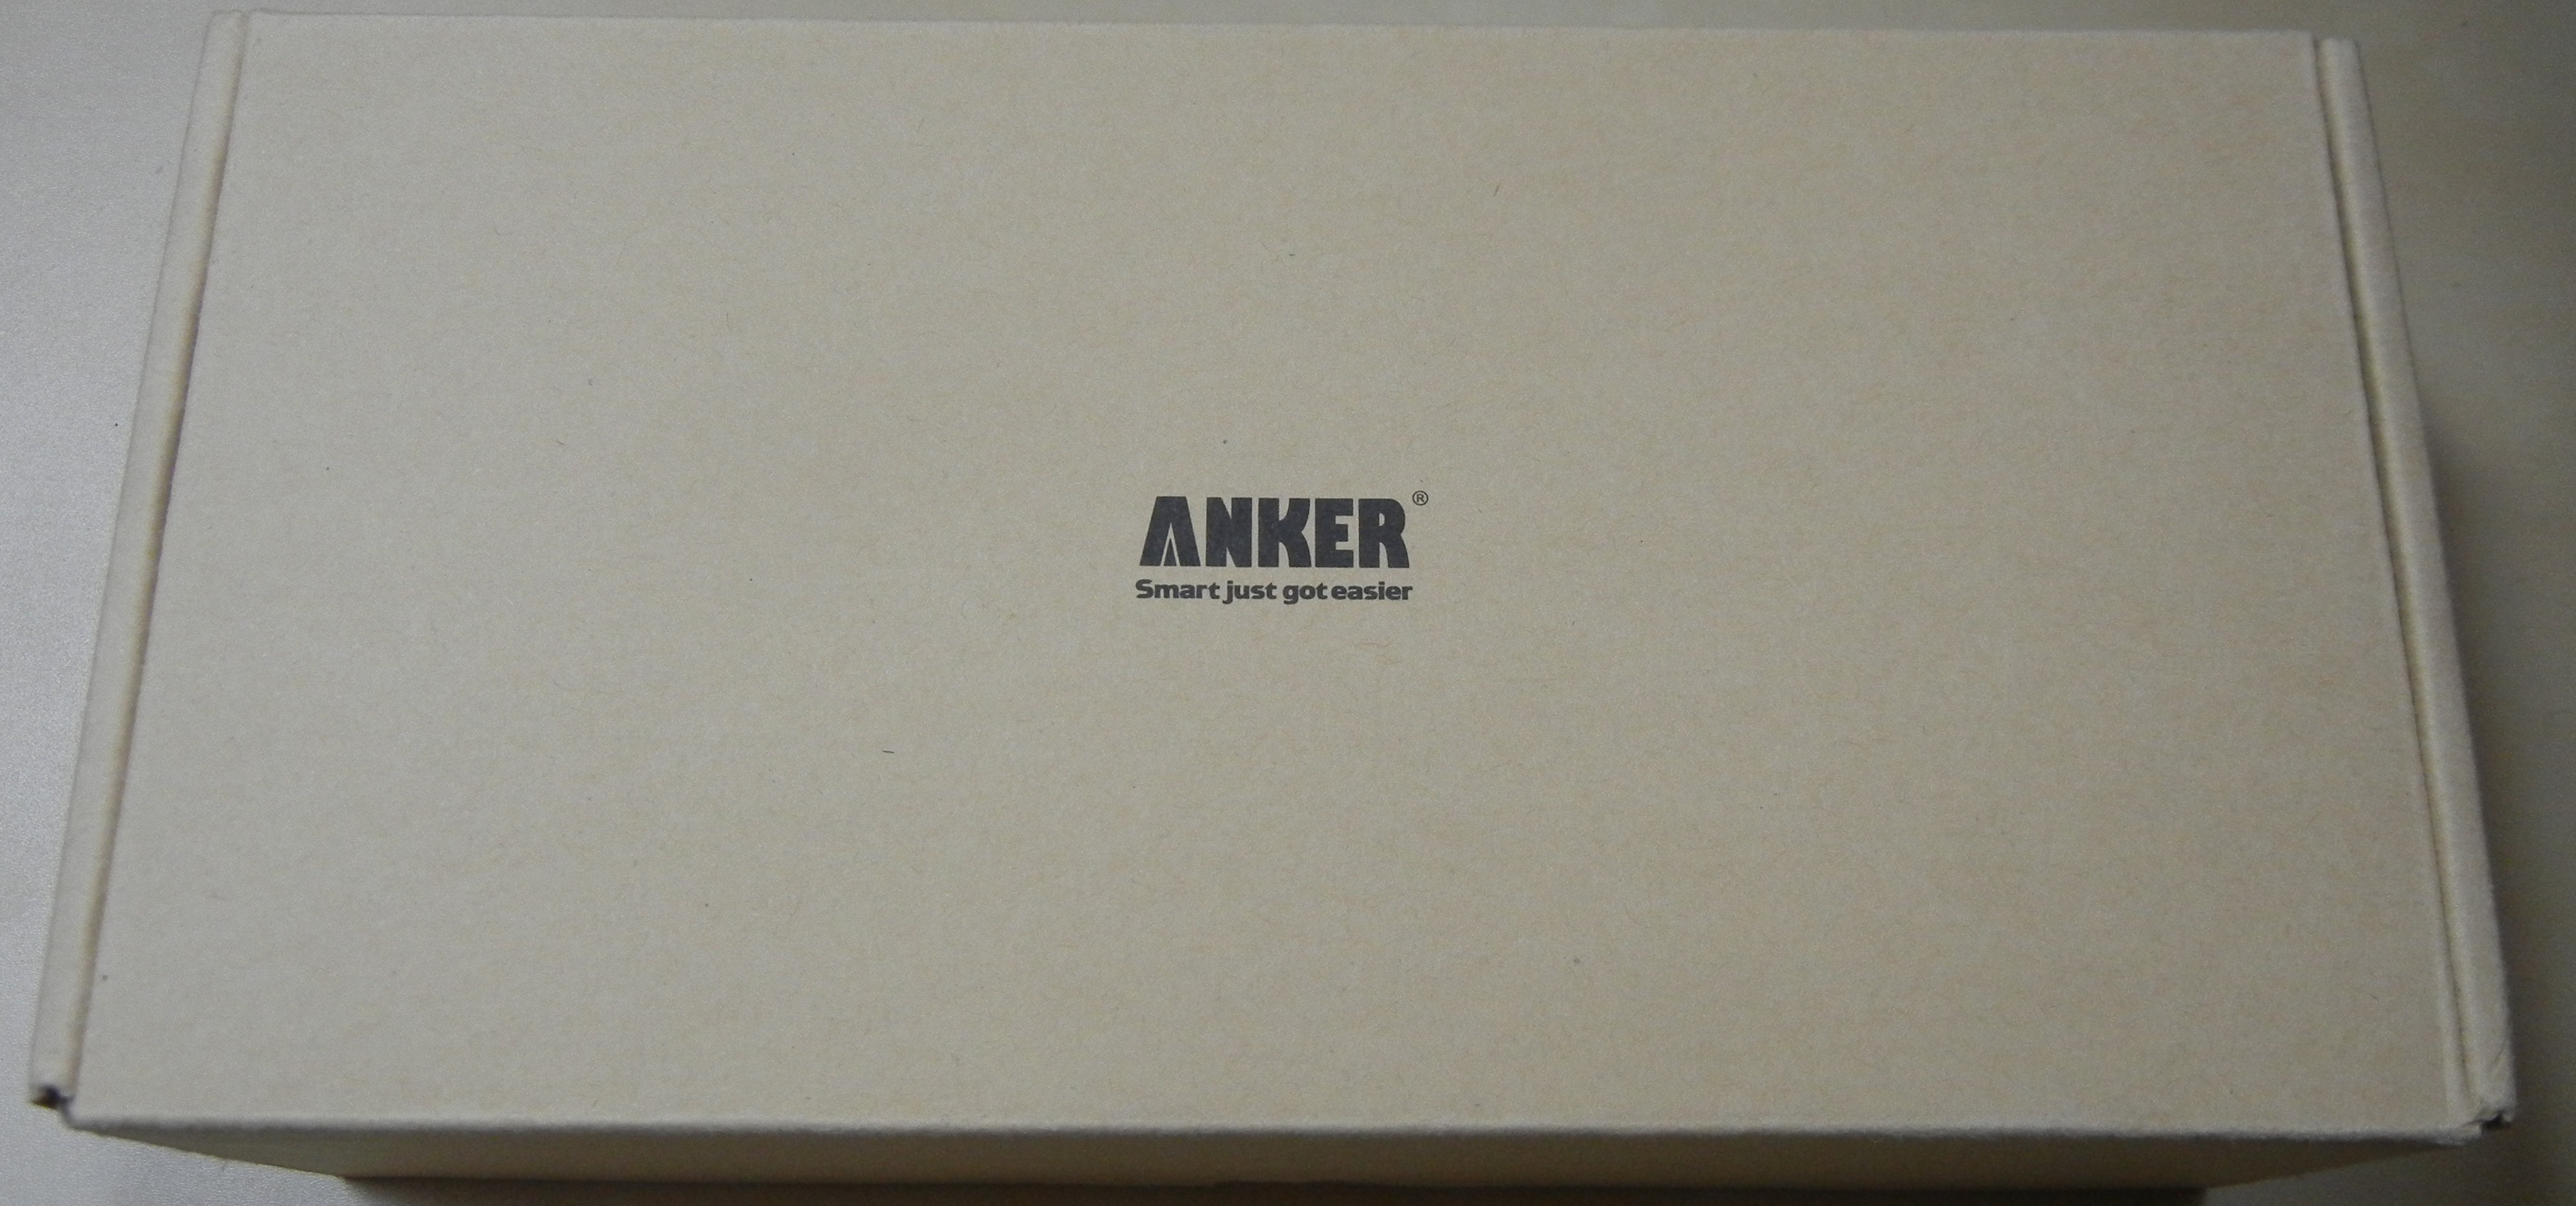 Anker Astro E4 2nd Gen Verpackung